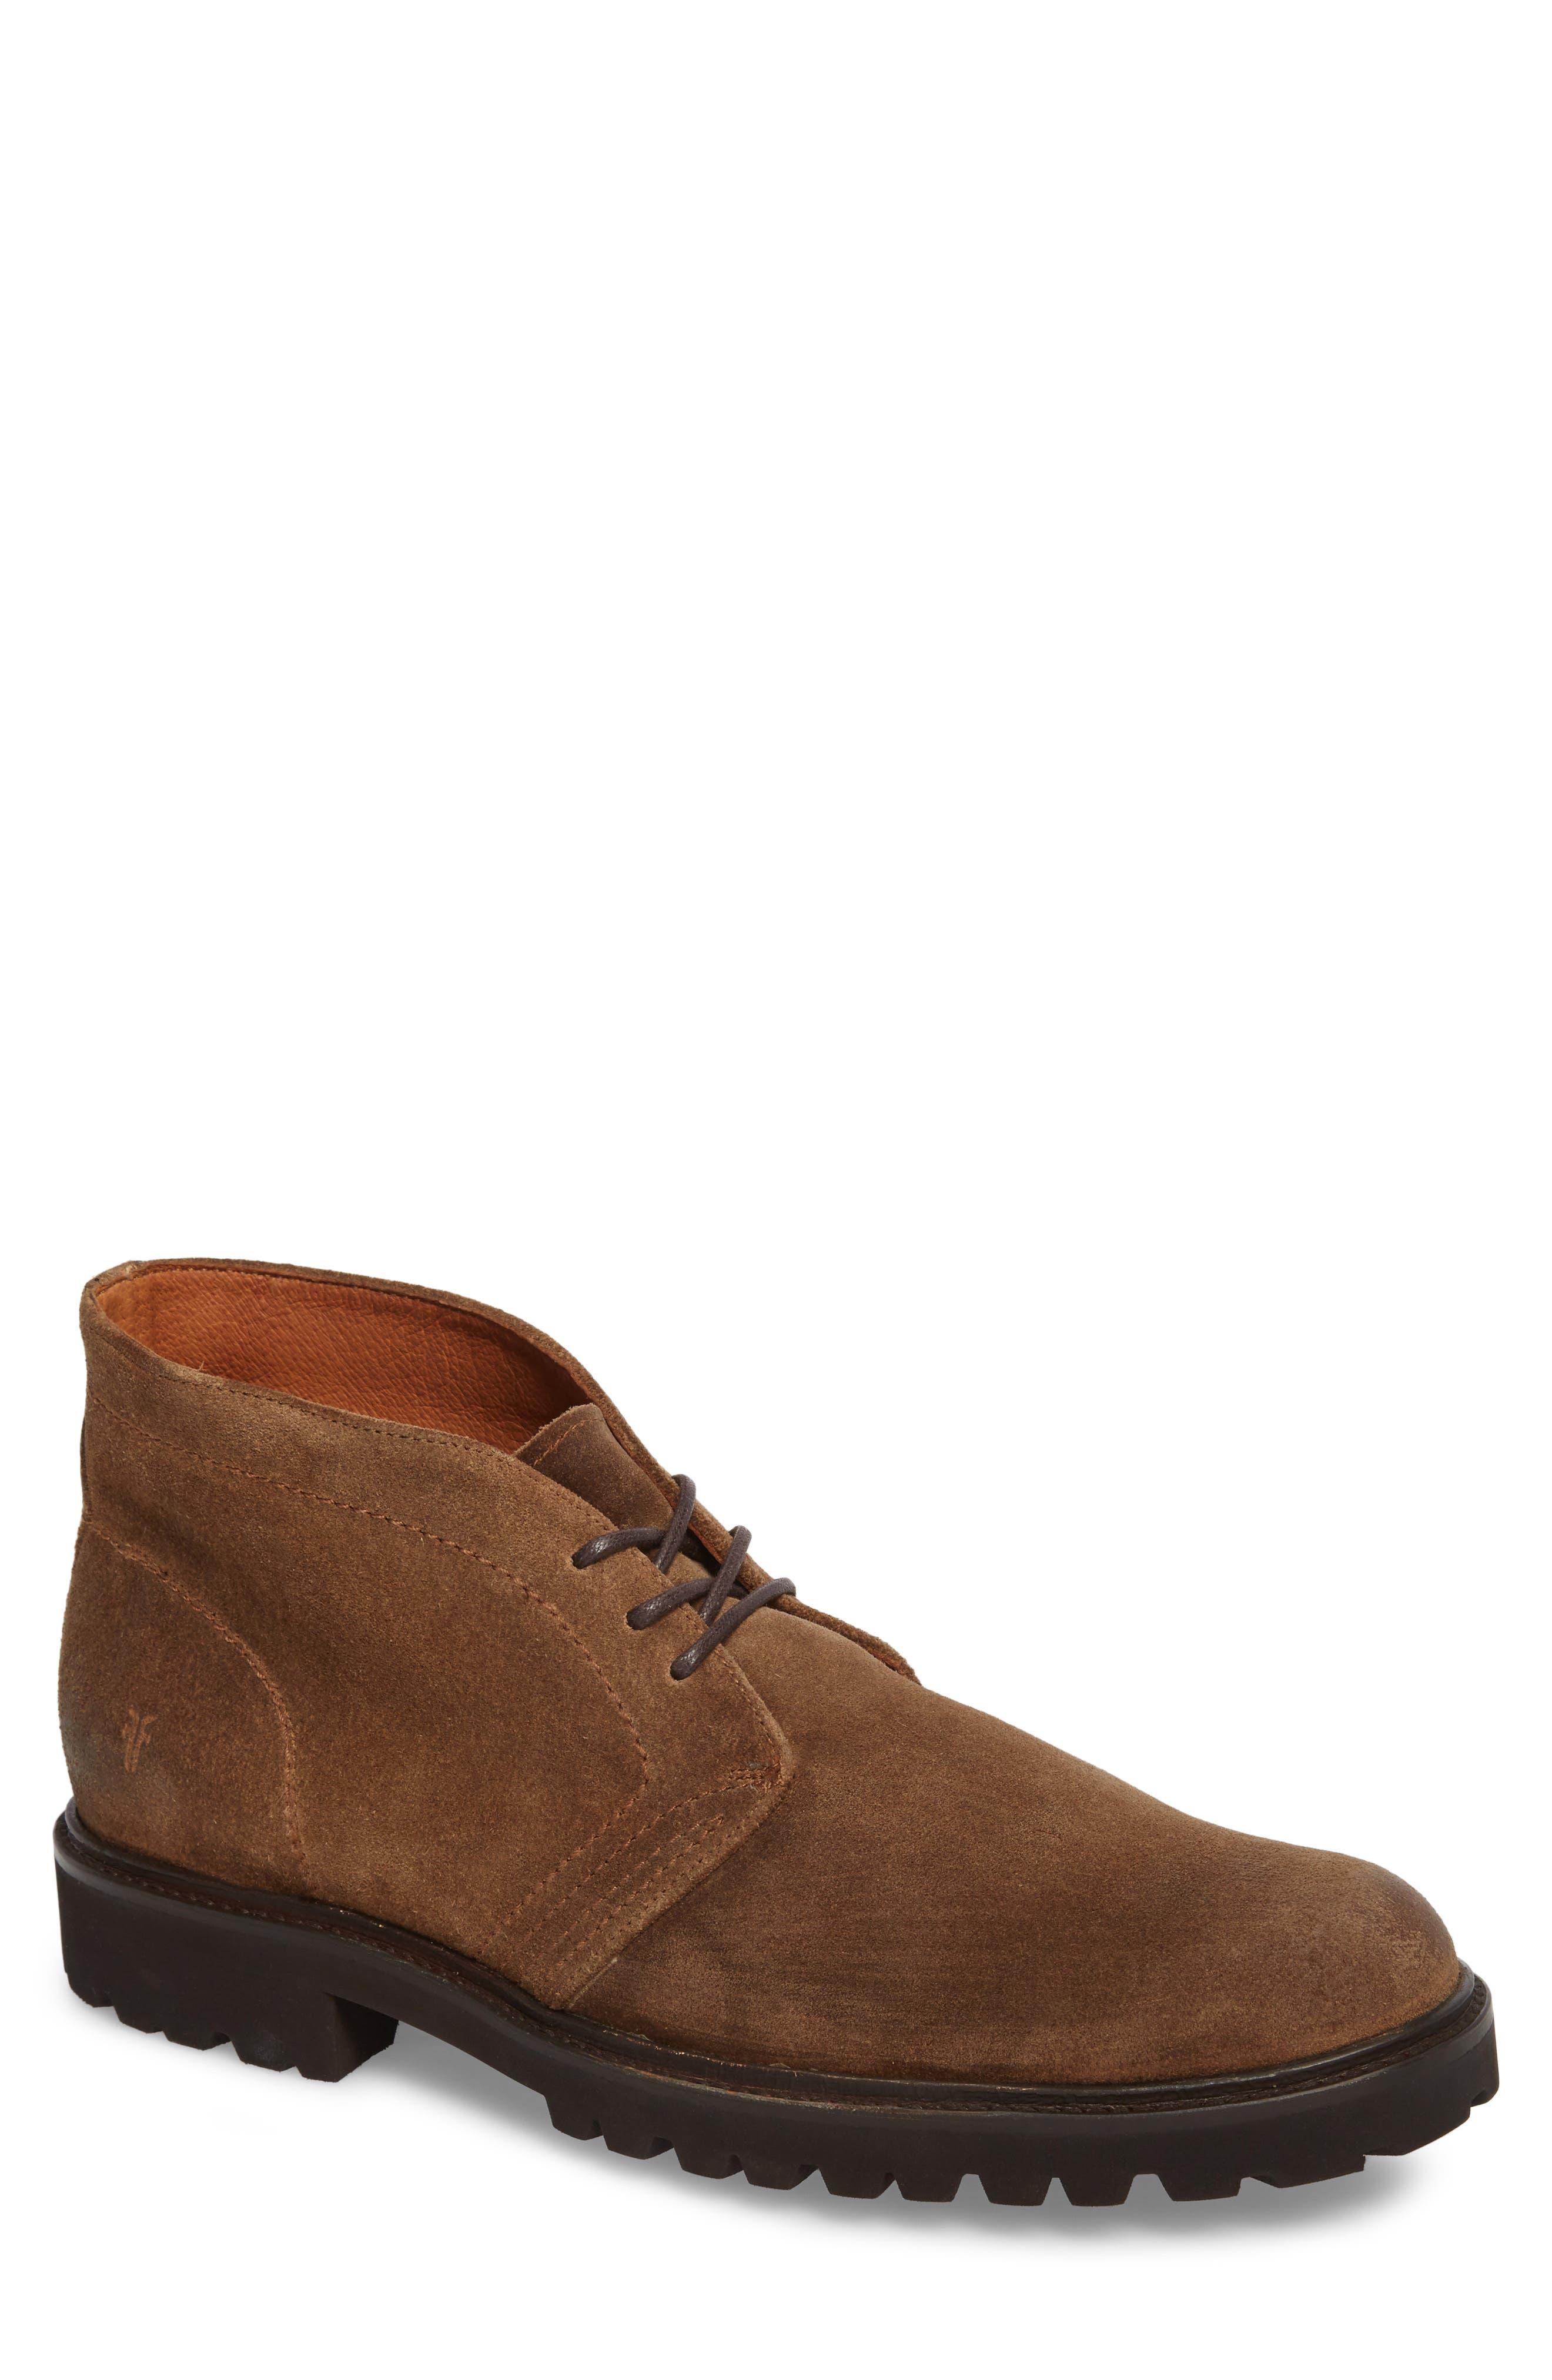 Edwin Waterproof Chukka Boot,                         Main,                         color, Fawn Leather